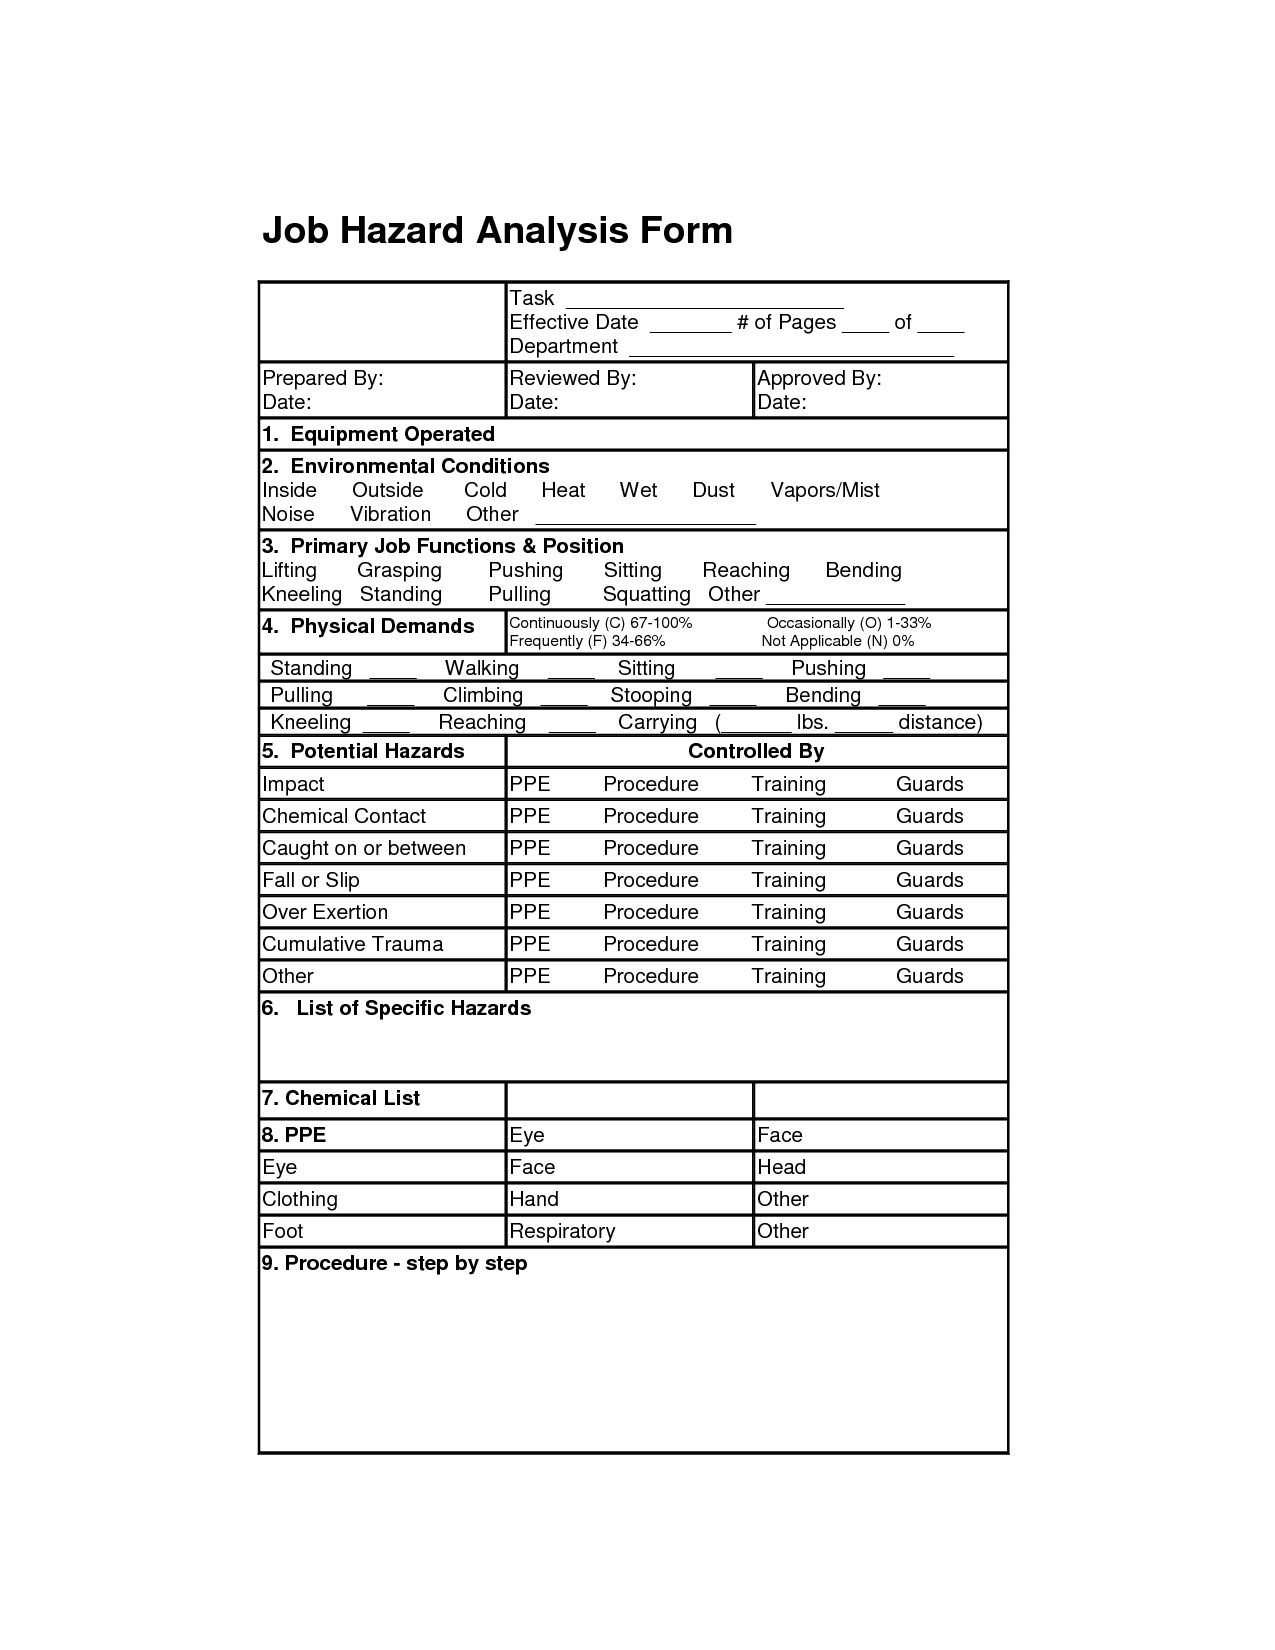 Job Hazard Analysis Form In 2020 Hazard Analysis Job Analysis